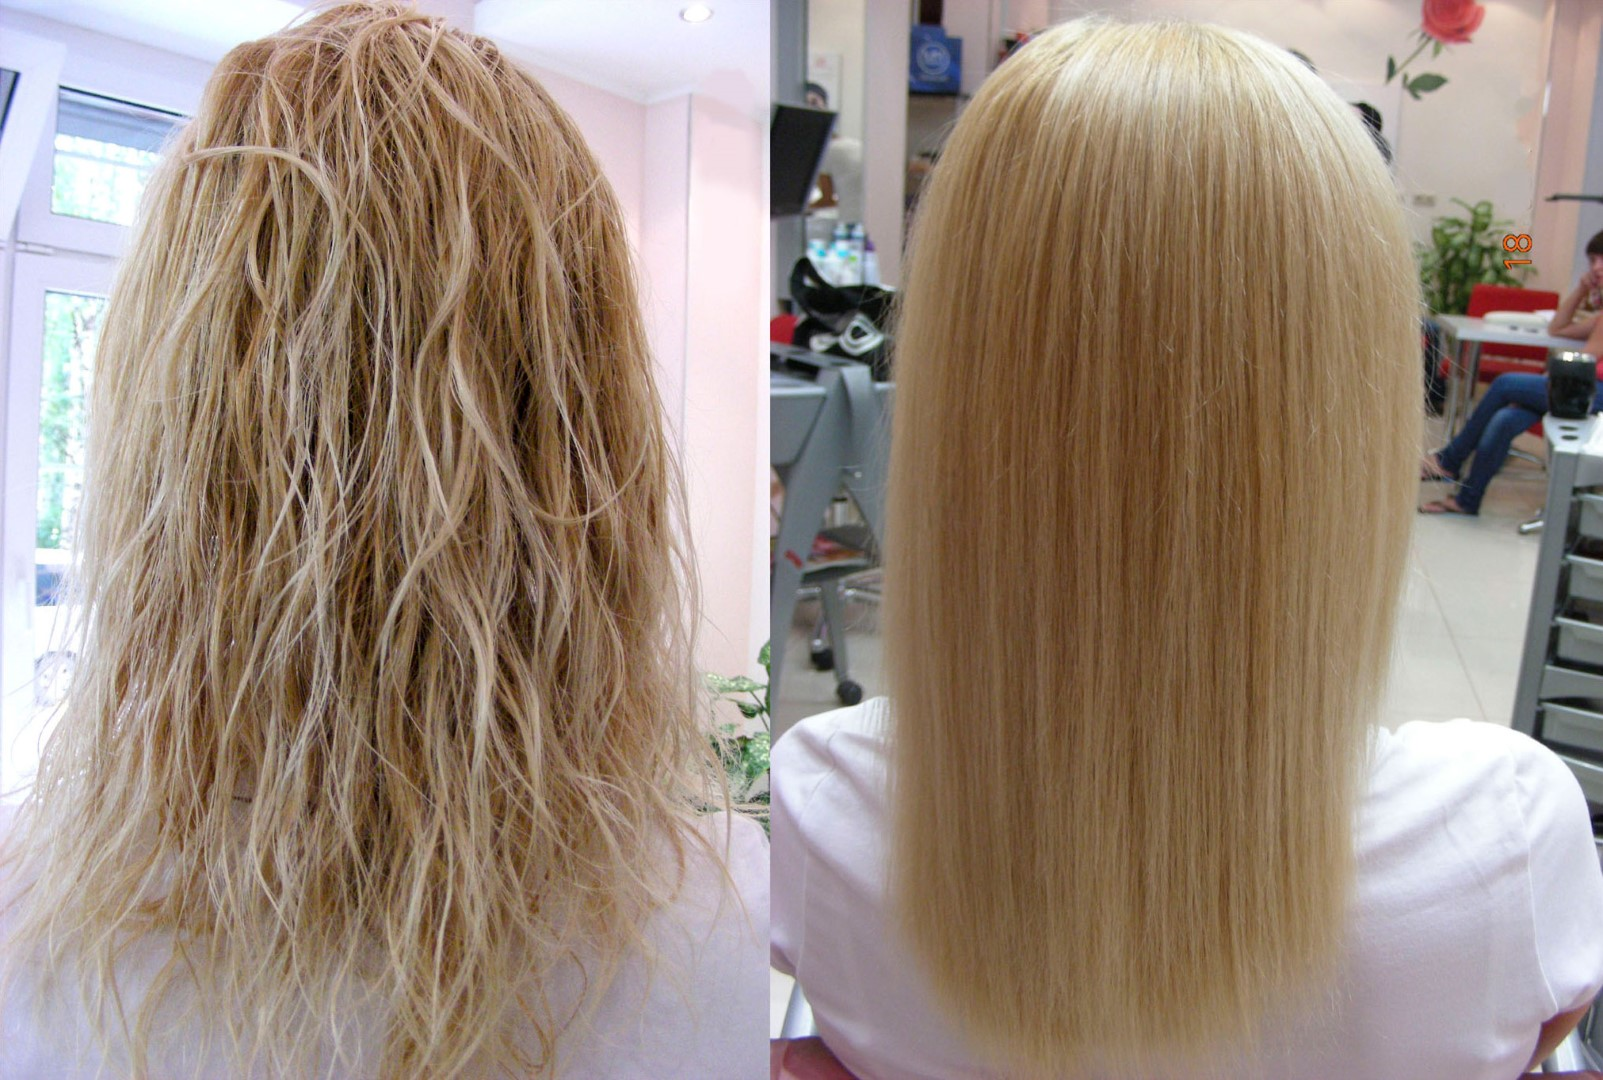 Картинки волосы вид сзади - 1aed